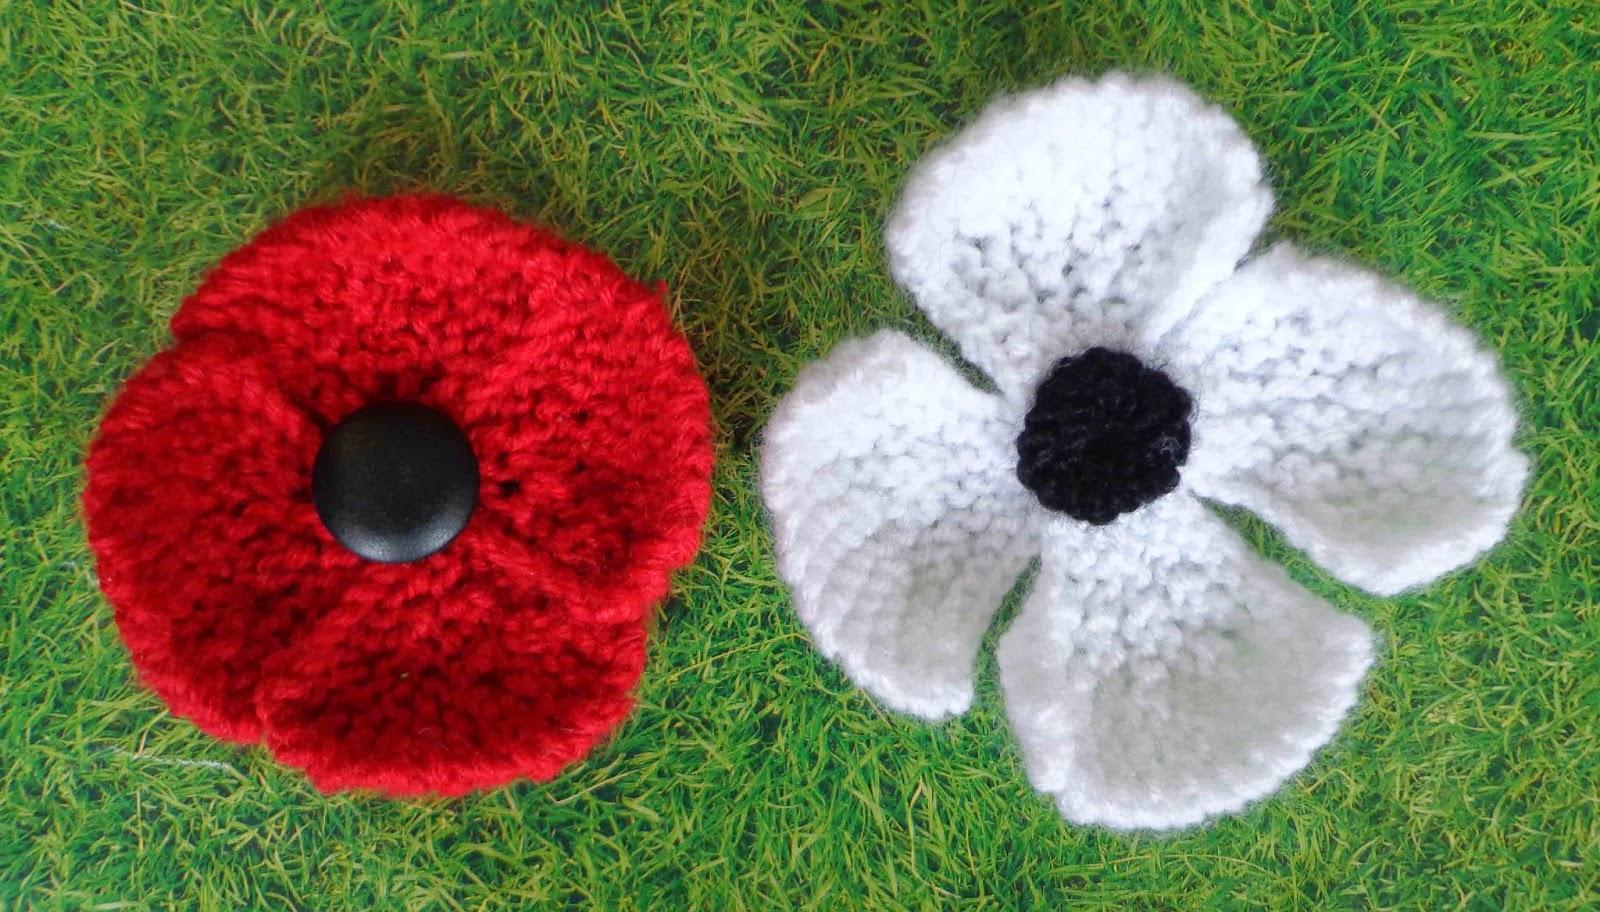 Hippystitch: Four Petal Poppy Knitting Pattern